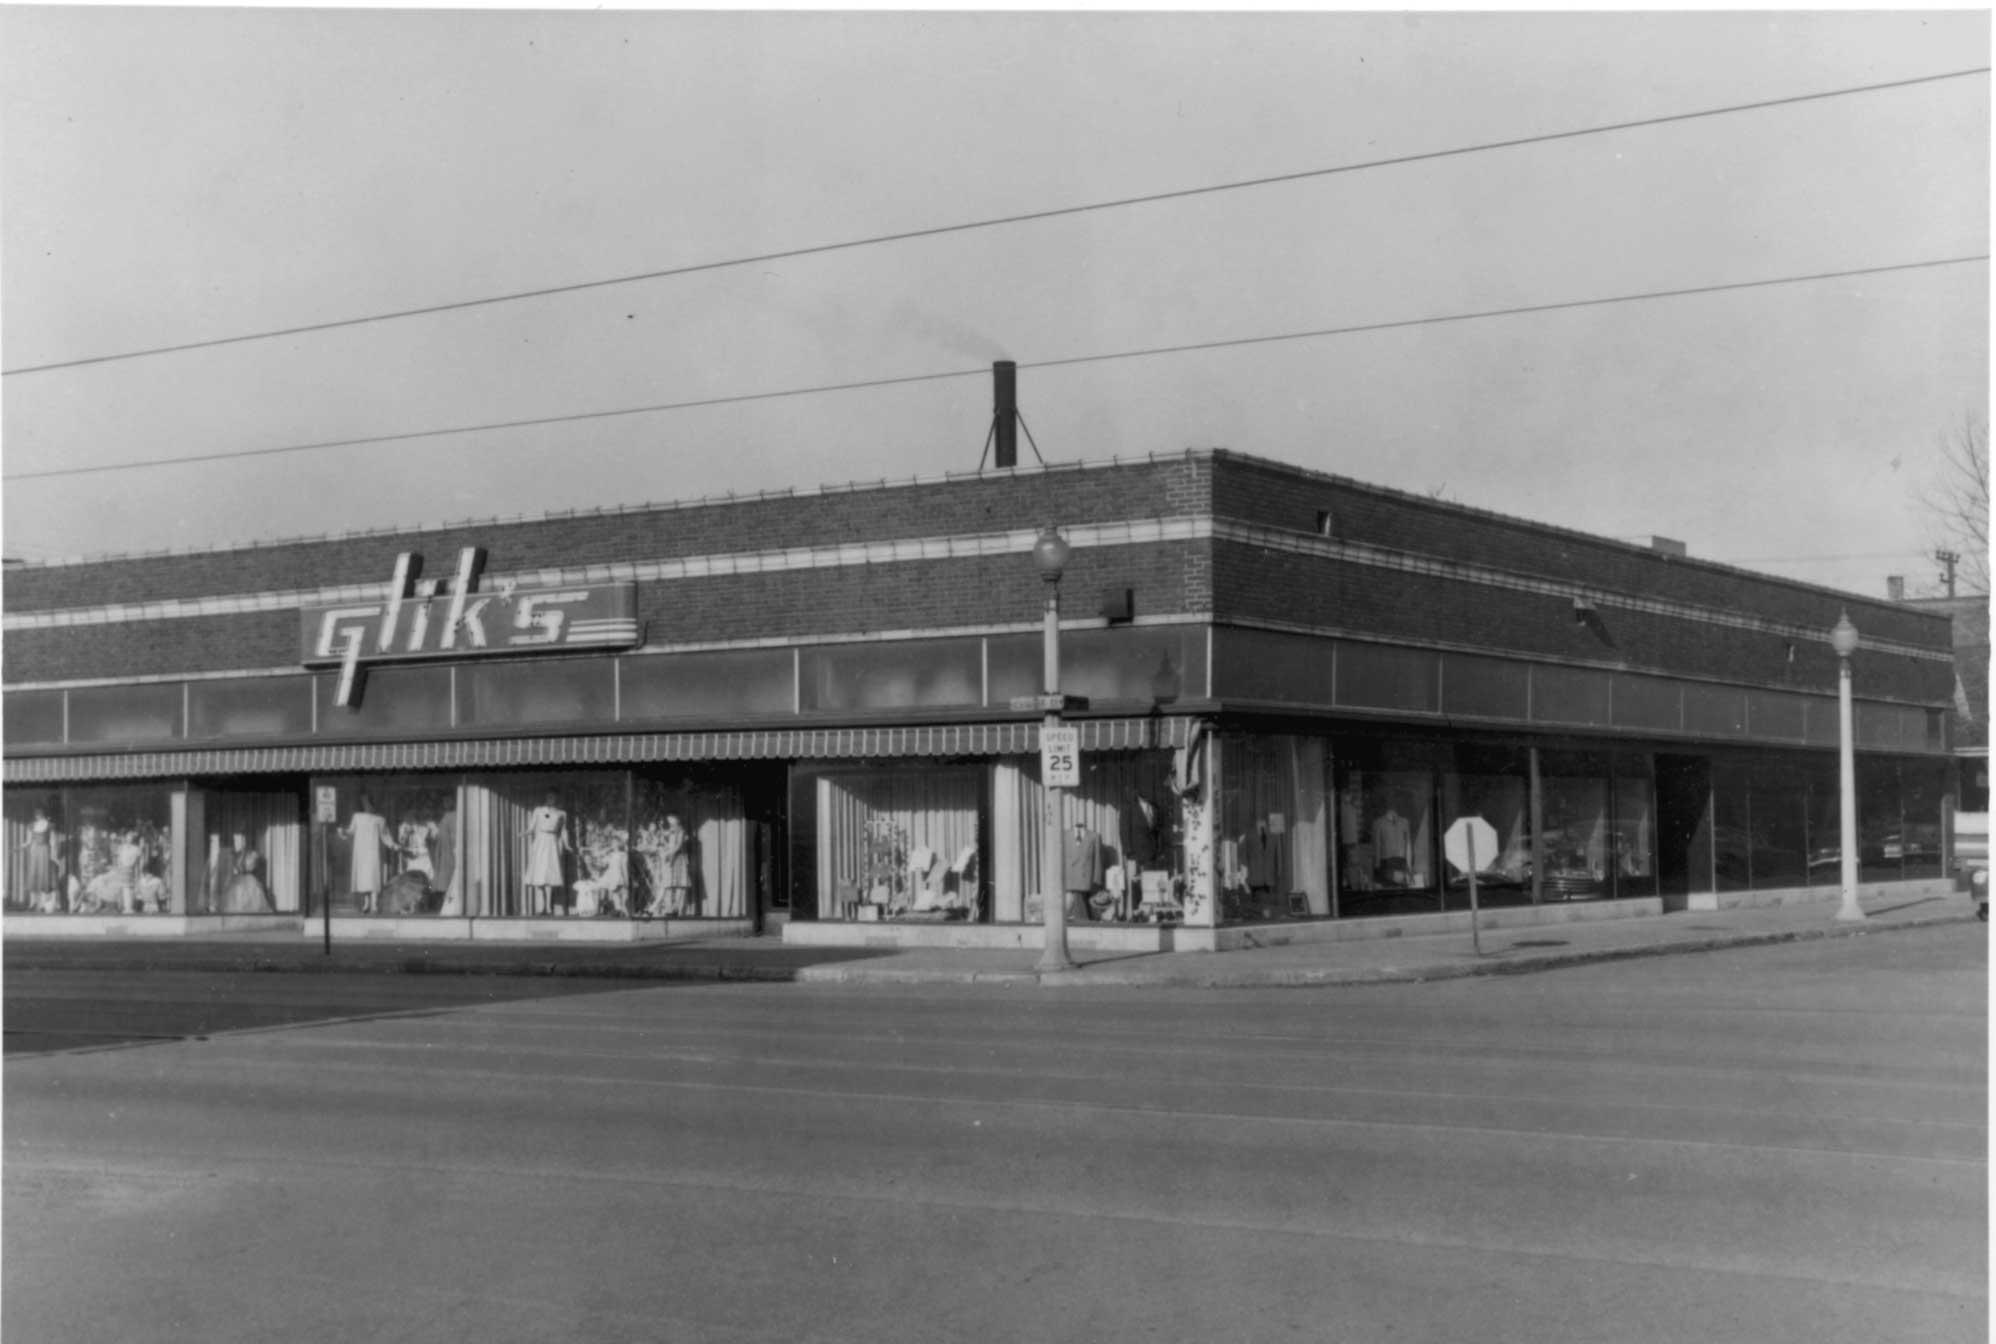 Glik's Madison